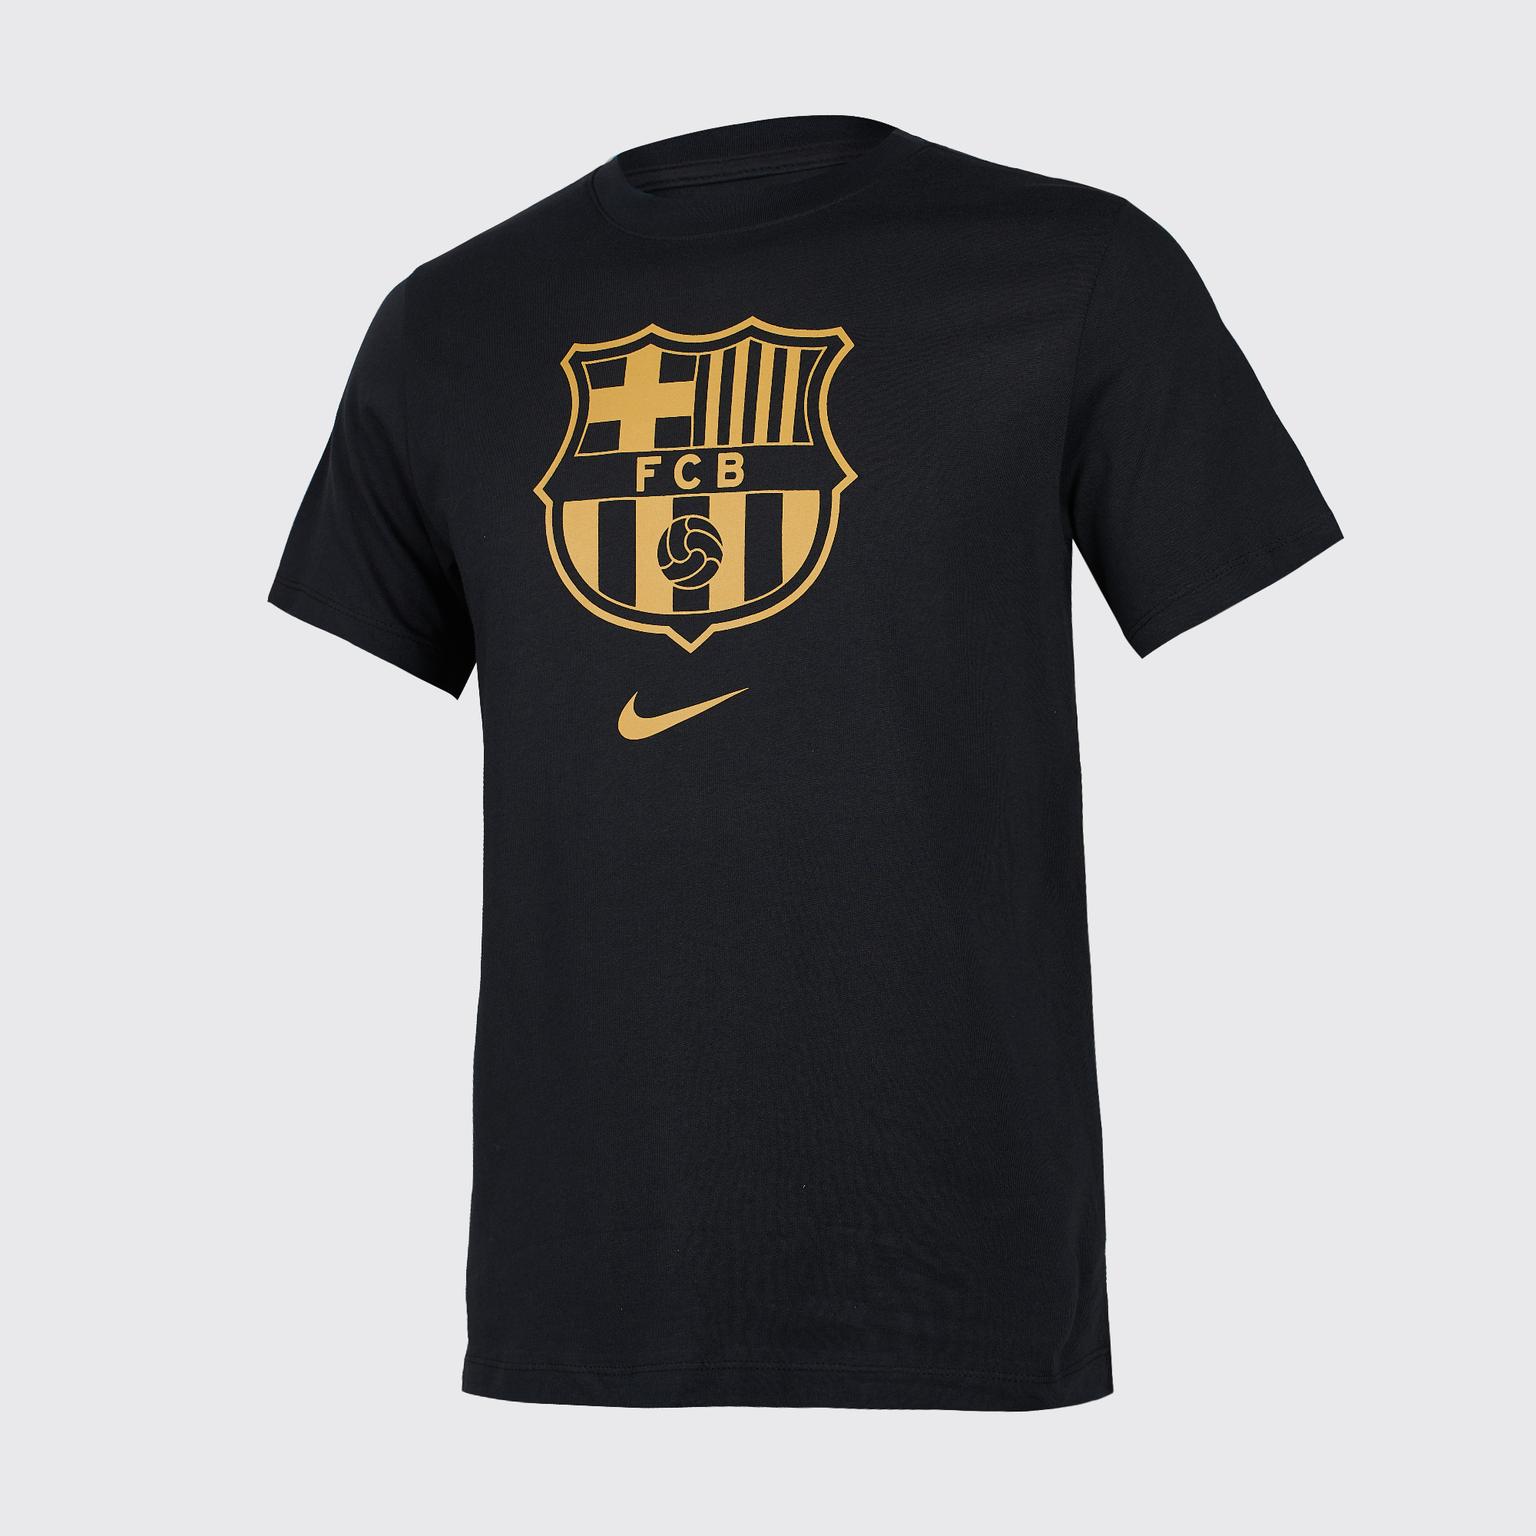 Футболка хлопковая Nike Barcelona Tee Evergreen сезон 2020/21 футболка подростковая nike neymar tee hero cd0174 010